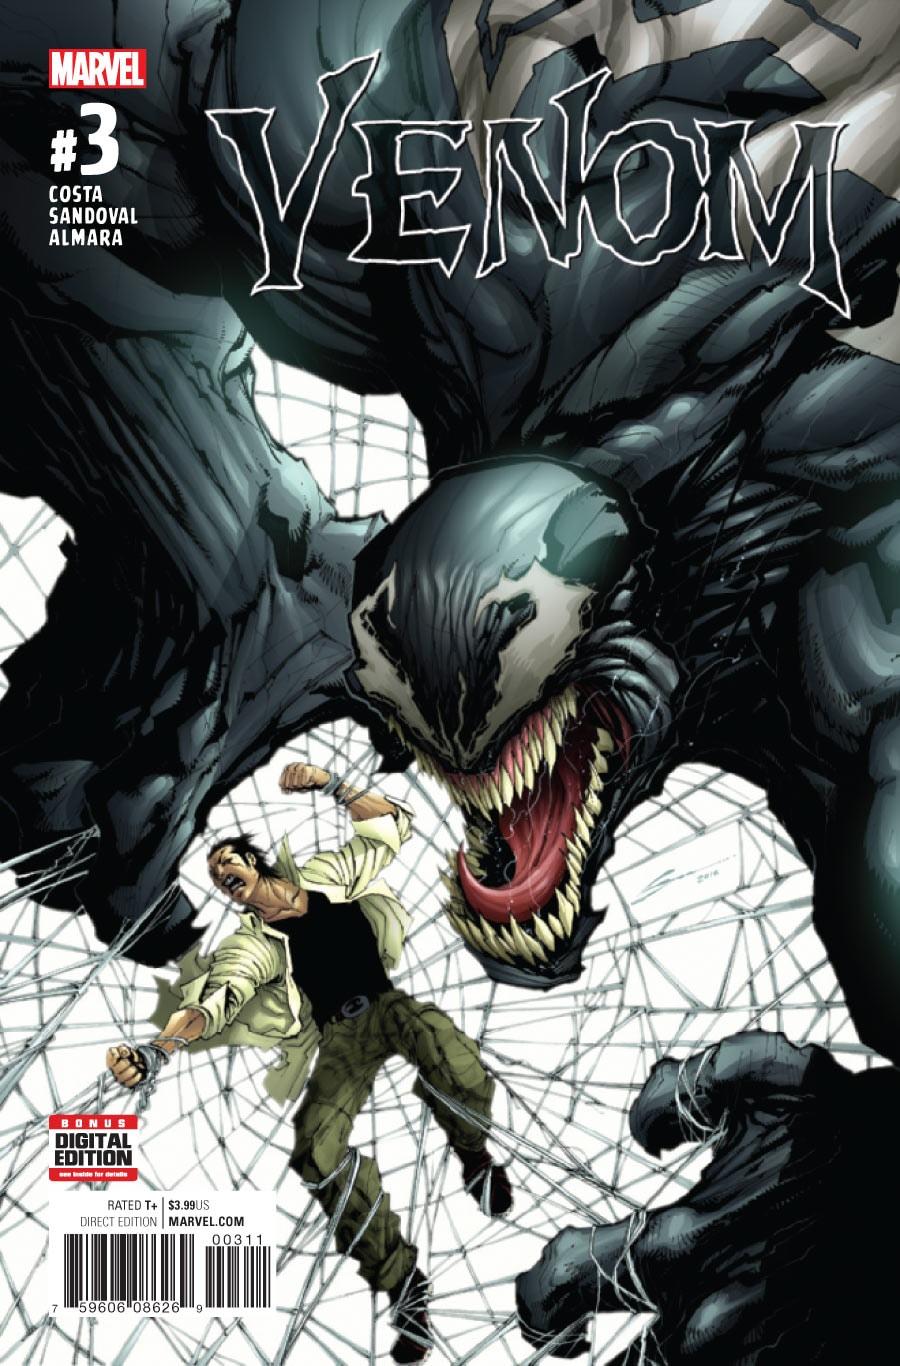 Venom Vol 3 3 | Marvel Database | FANDOM powered by Wikia